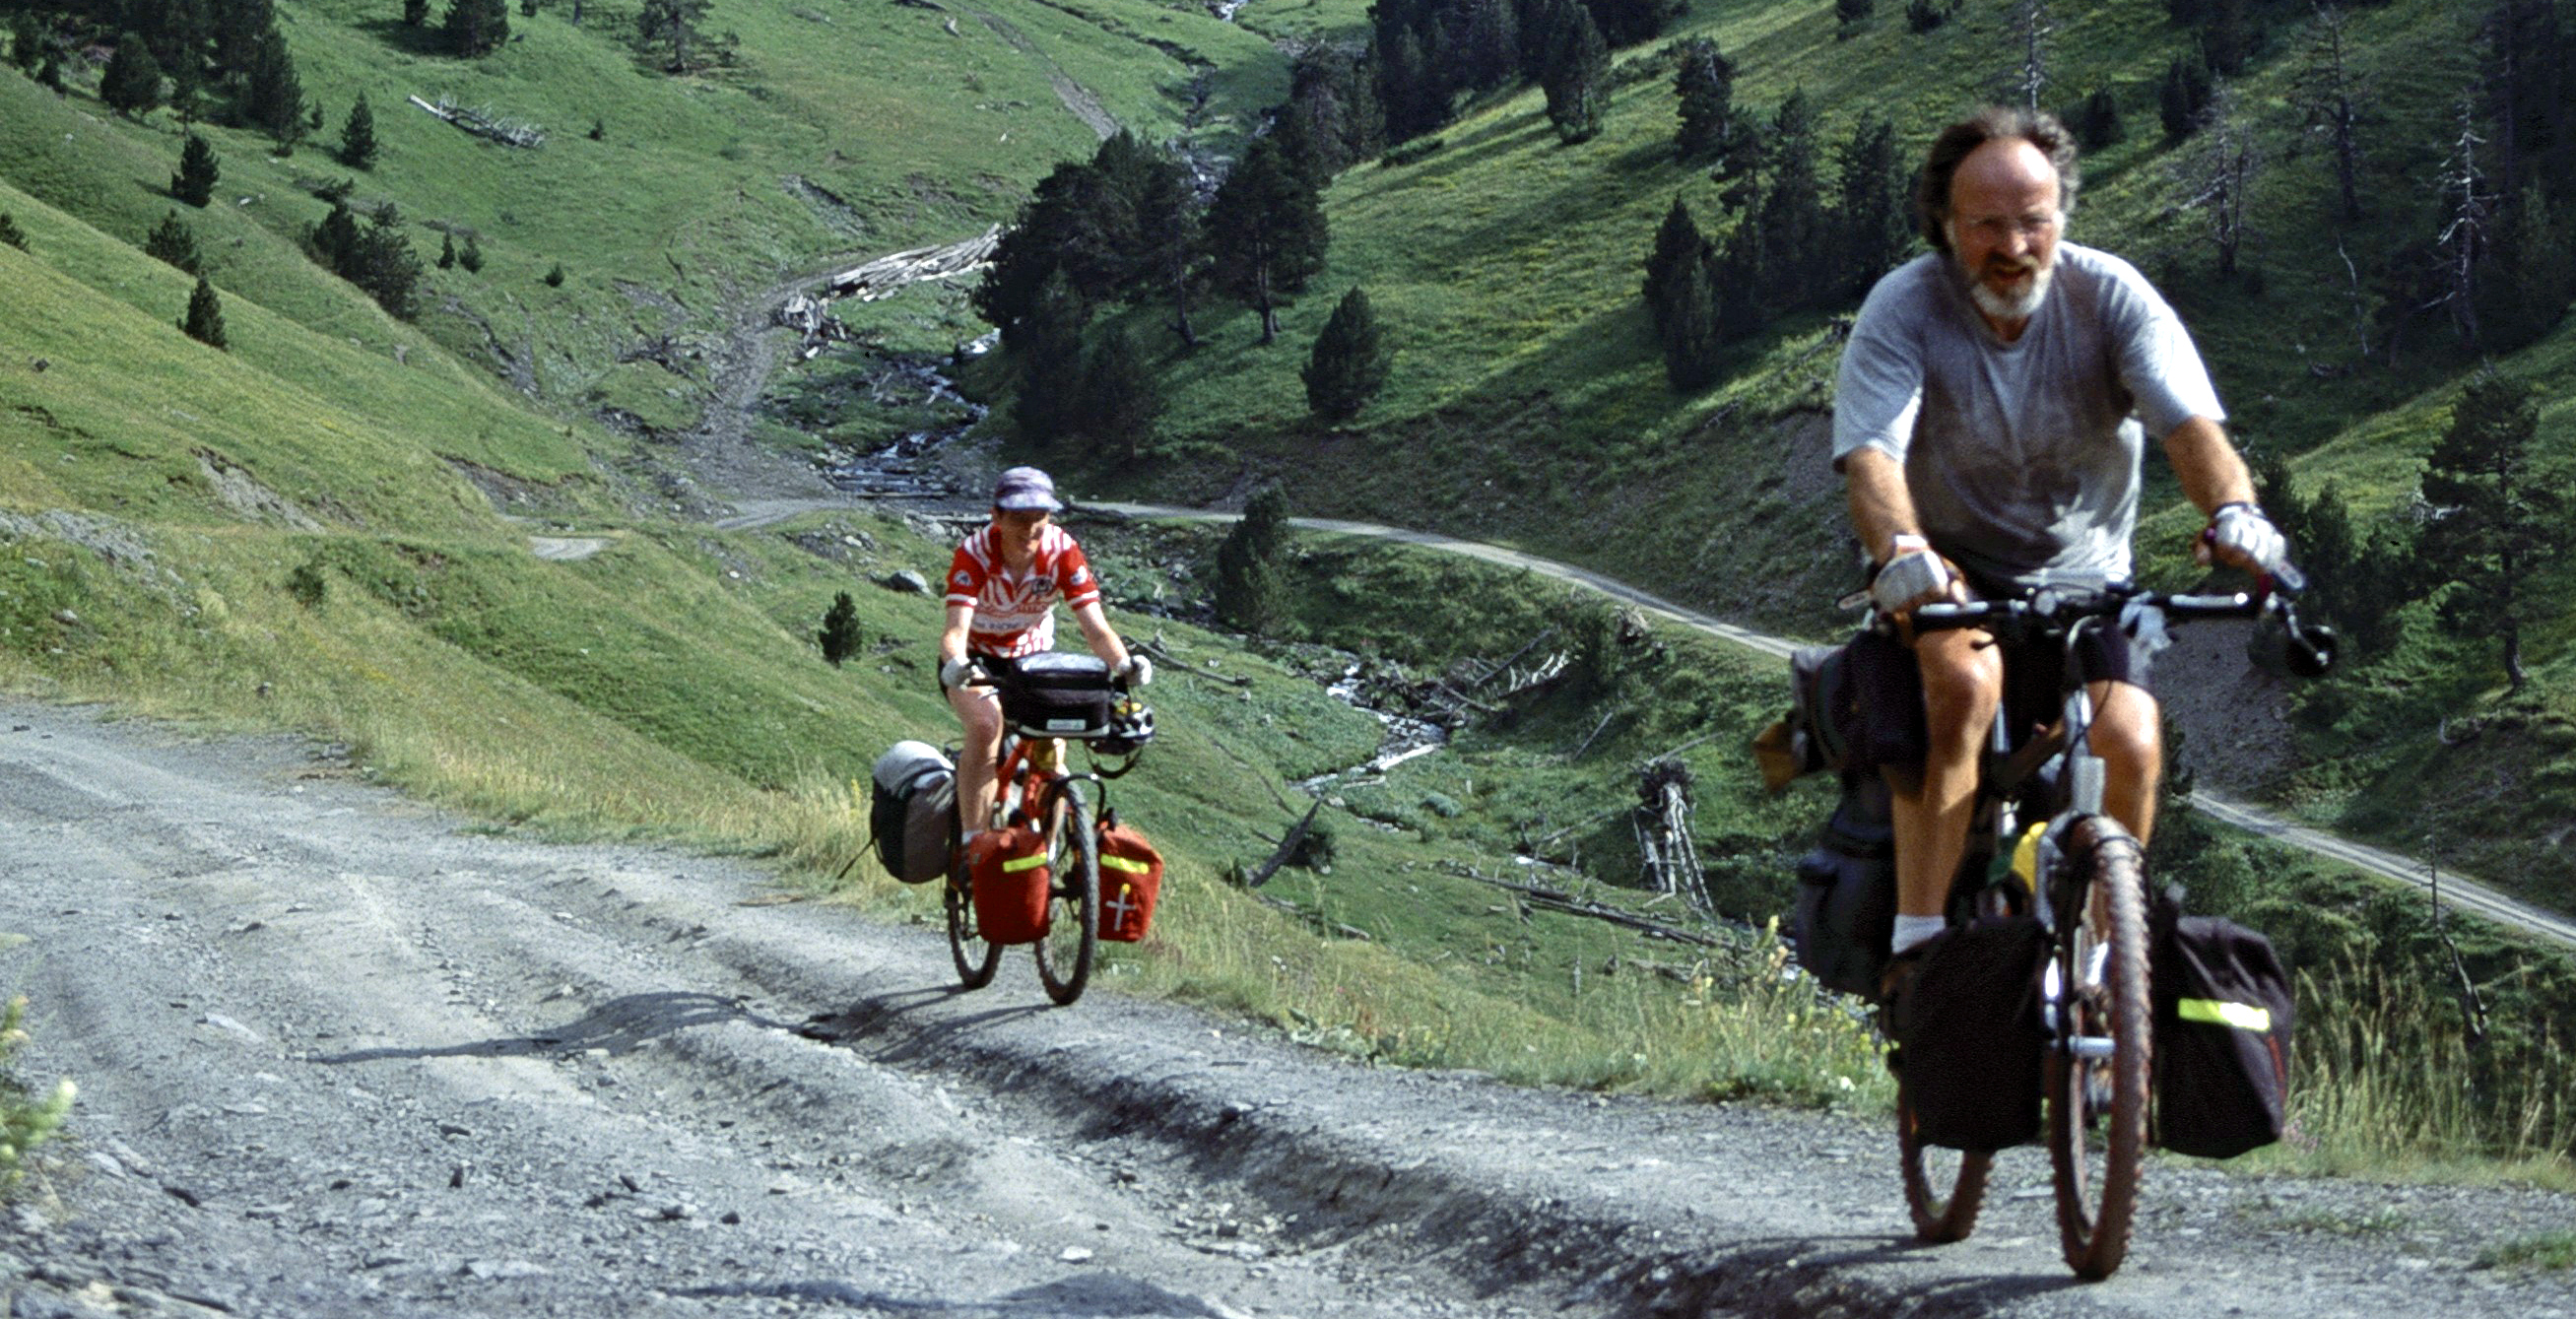 Cykling i Bjerge